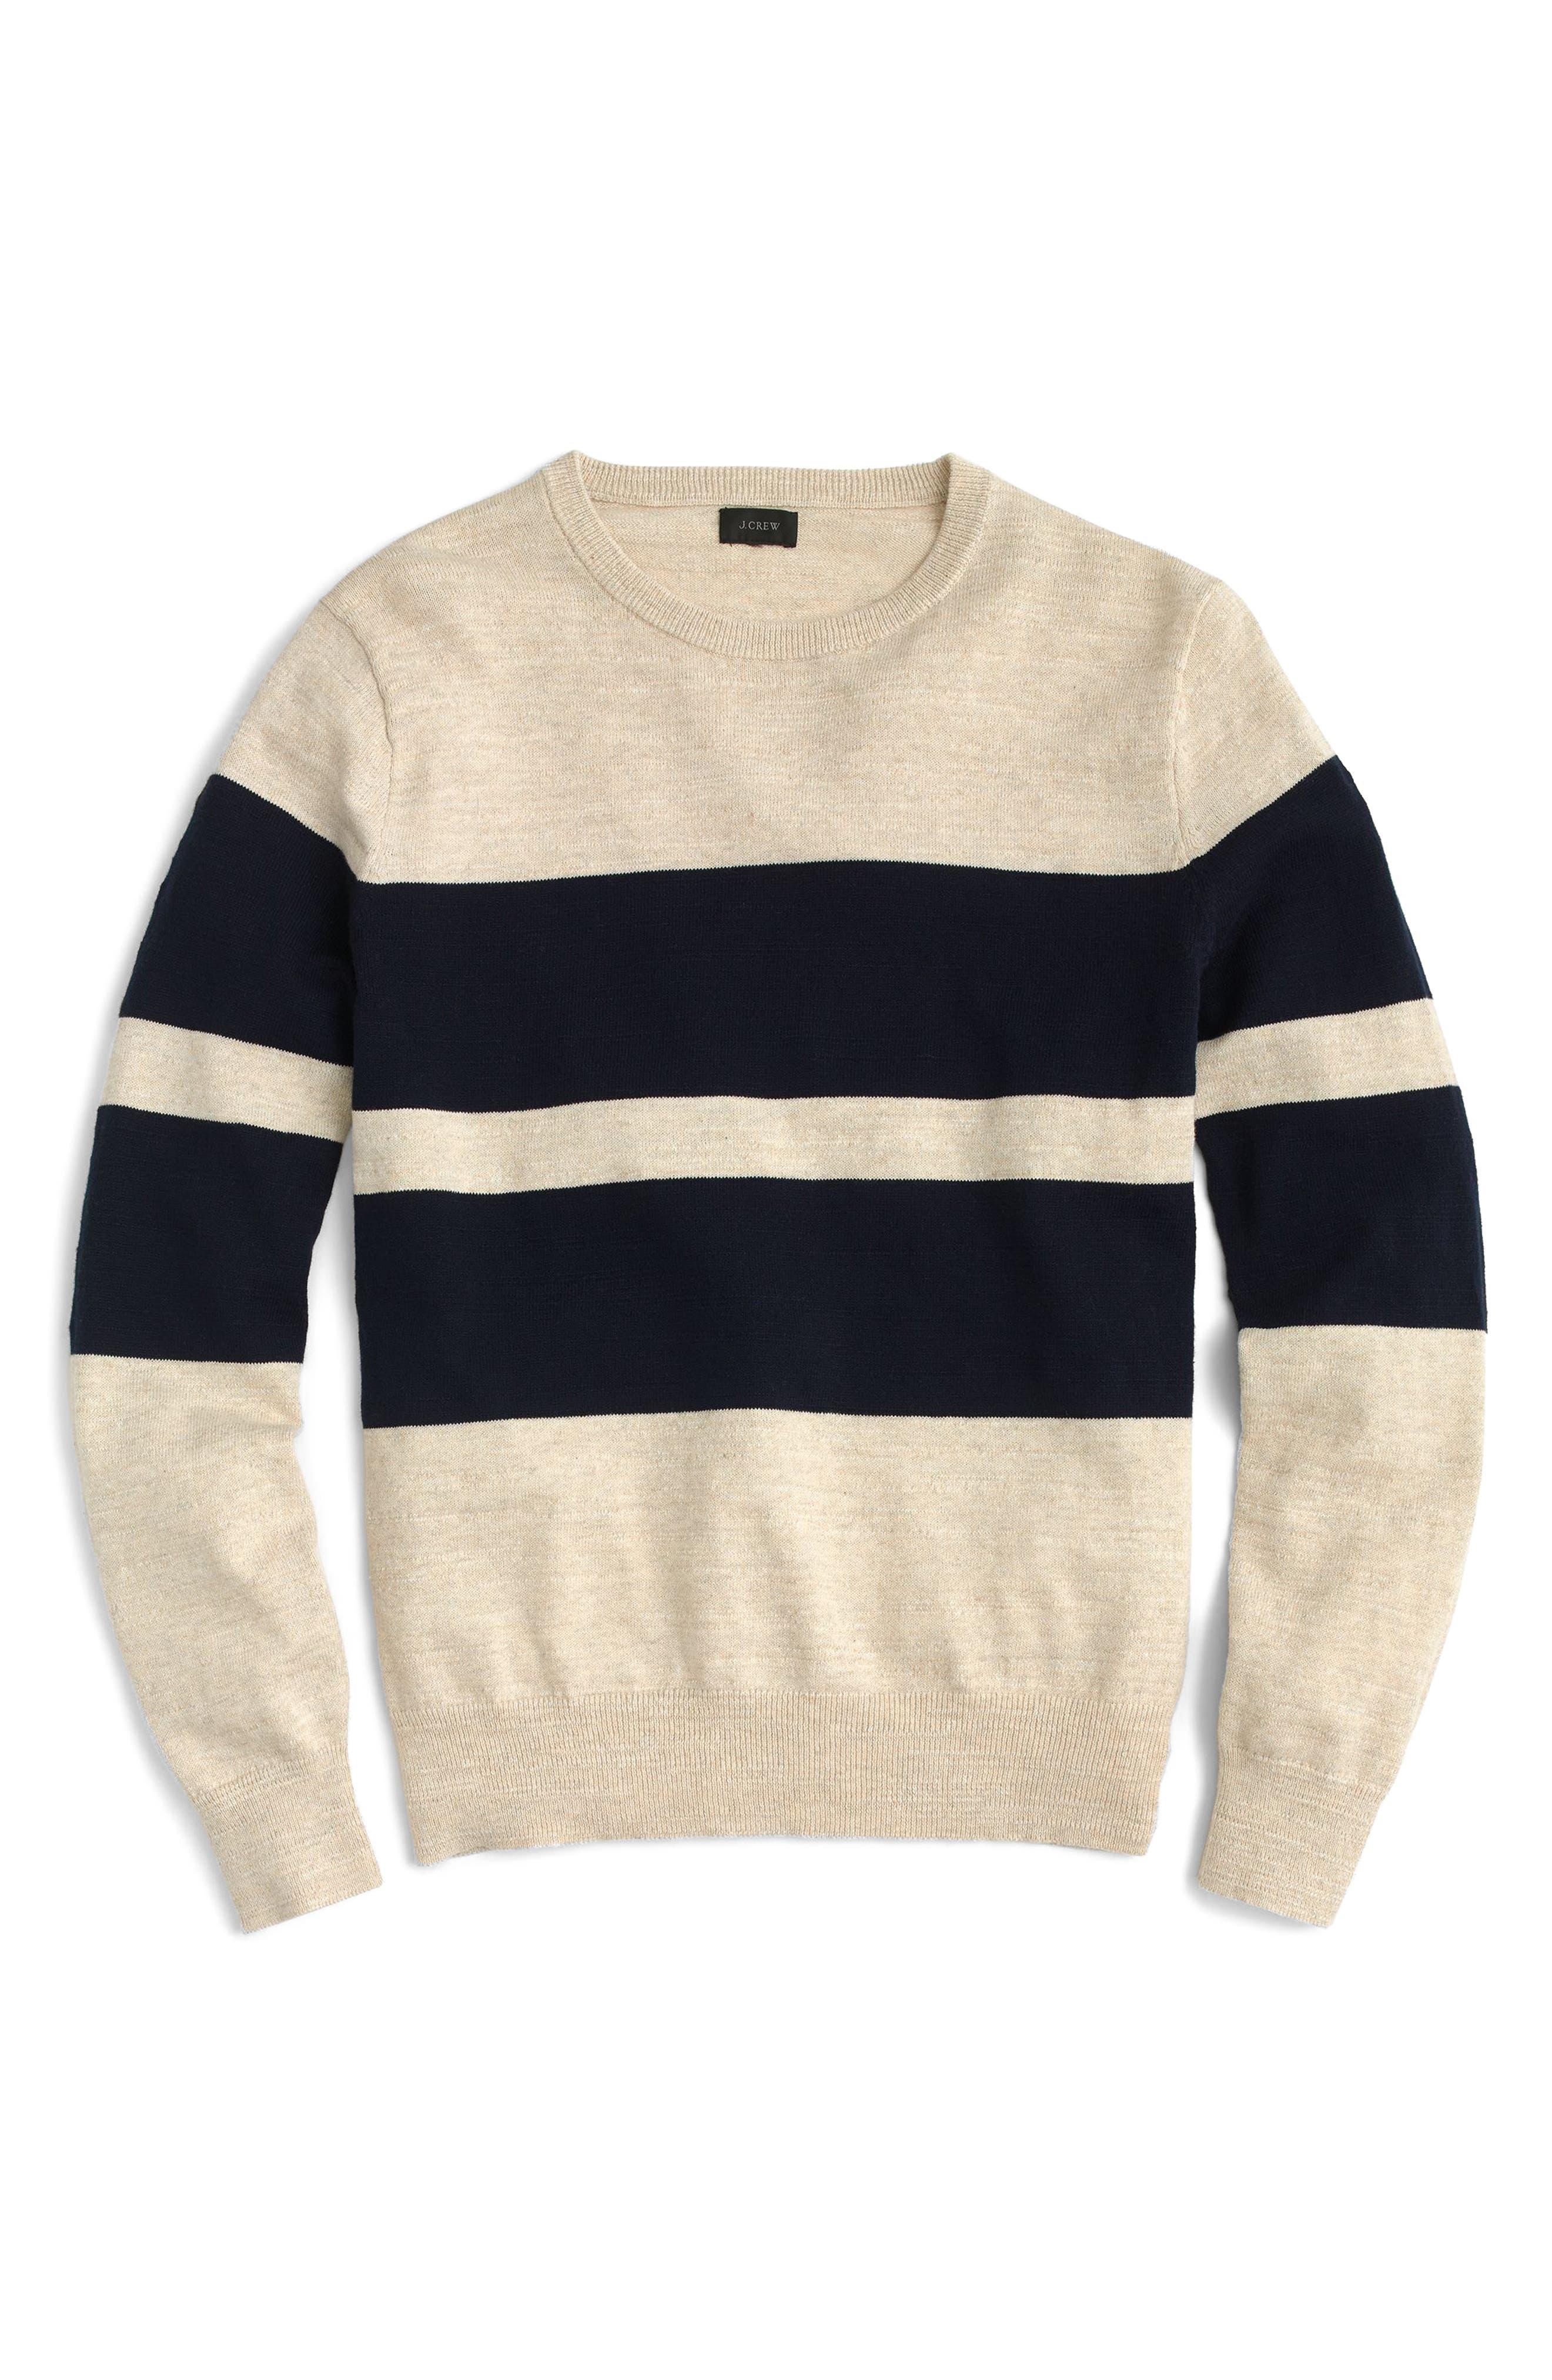 J.Crew Slim Fit Uneven Budding Stripe Sweater,                             Main thumbnail 1, color,                             Navy